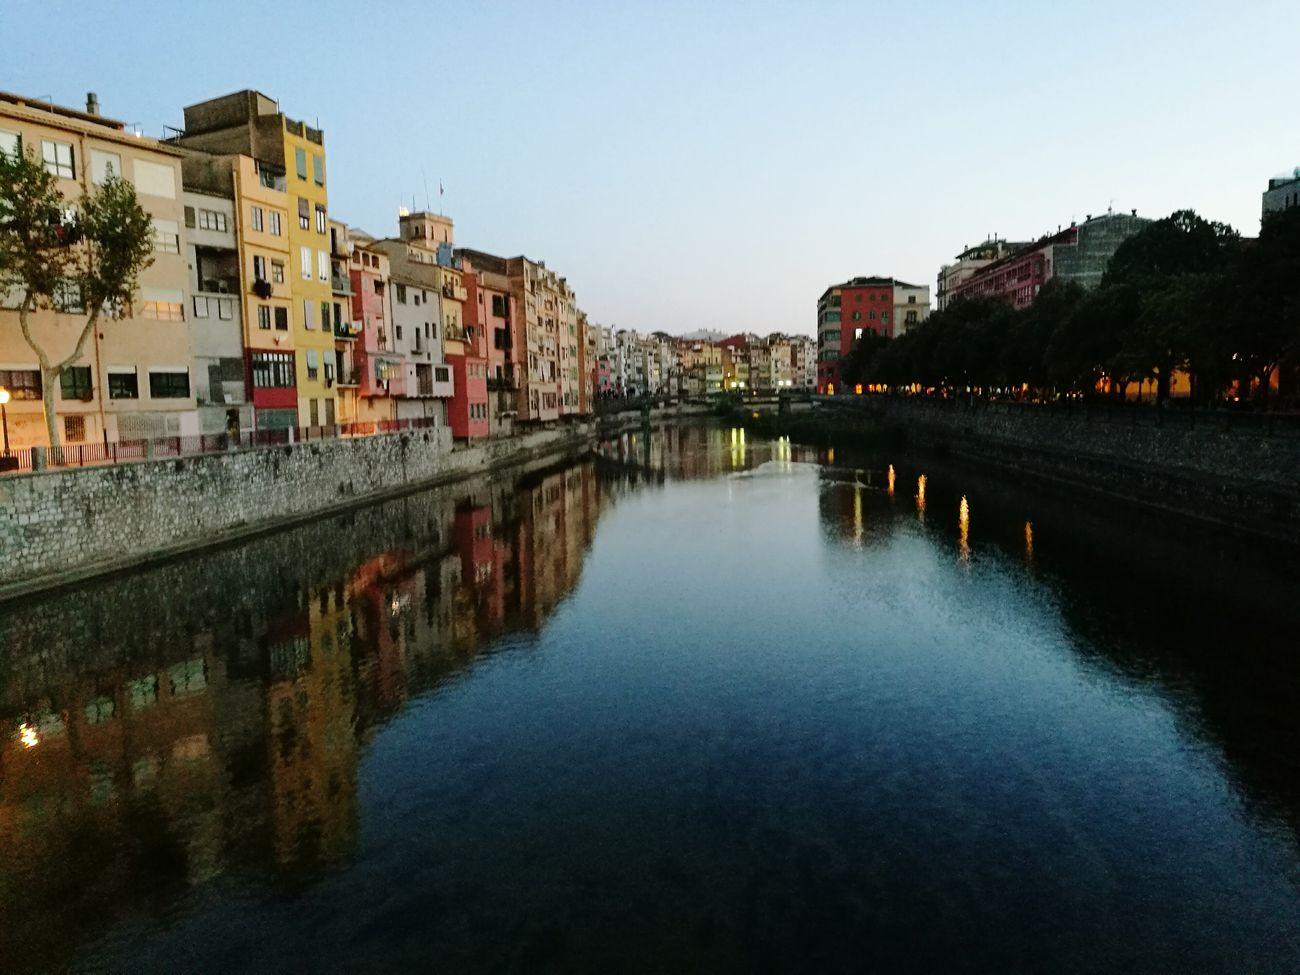 Sunset in Girona, Catalonia. City Girona Gironamenamora River MedievalTown Sunset Autumn First Eyeem Photo